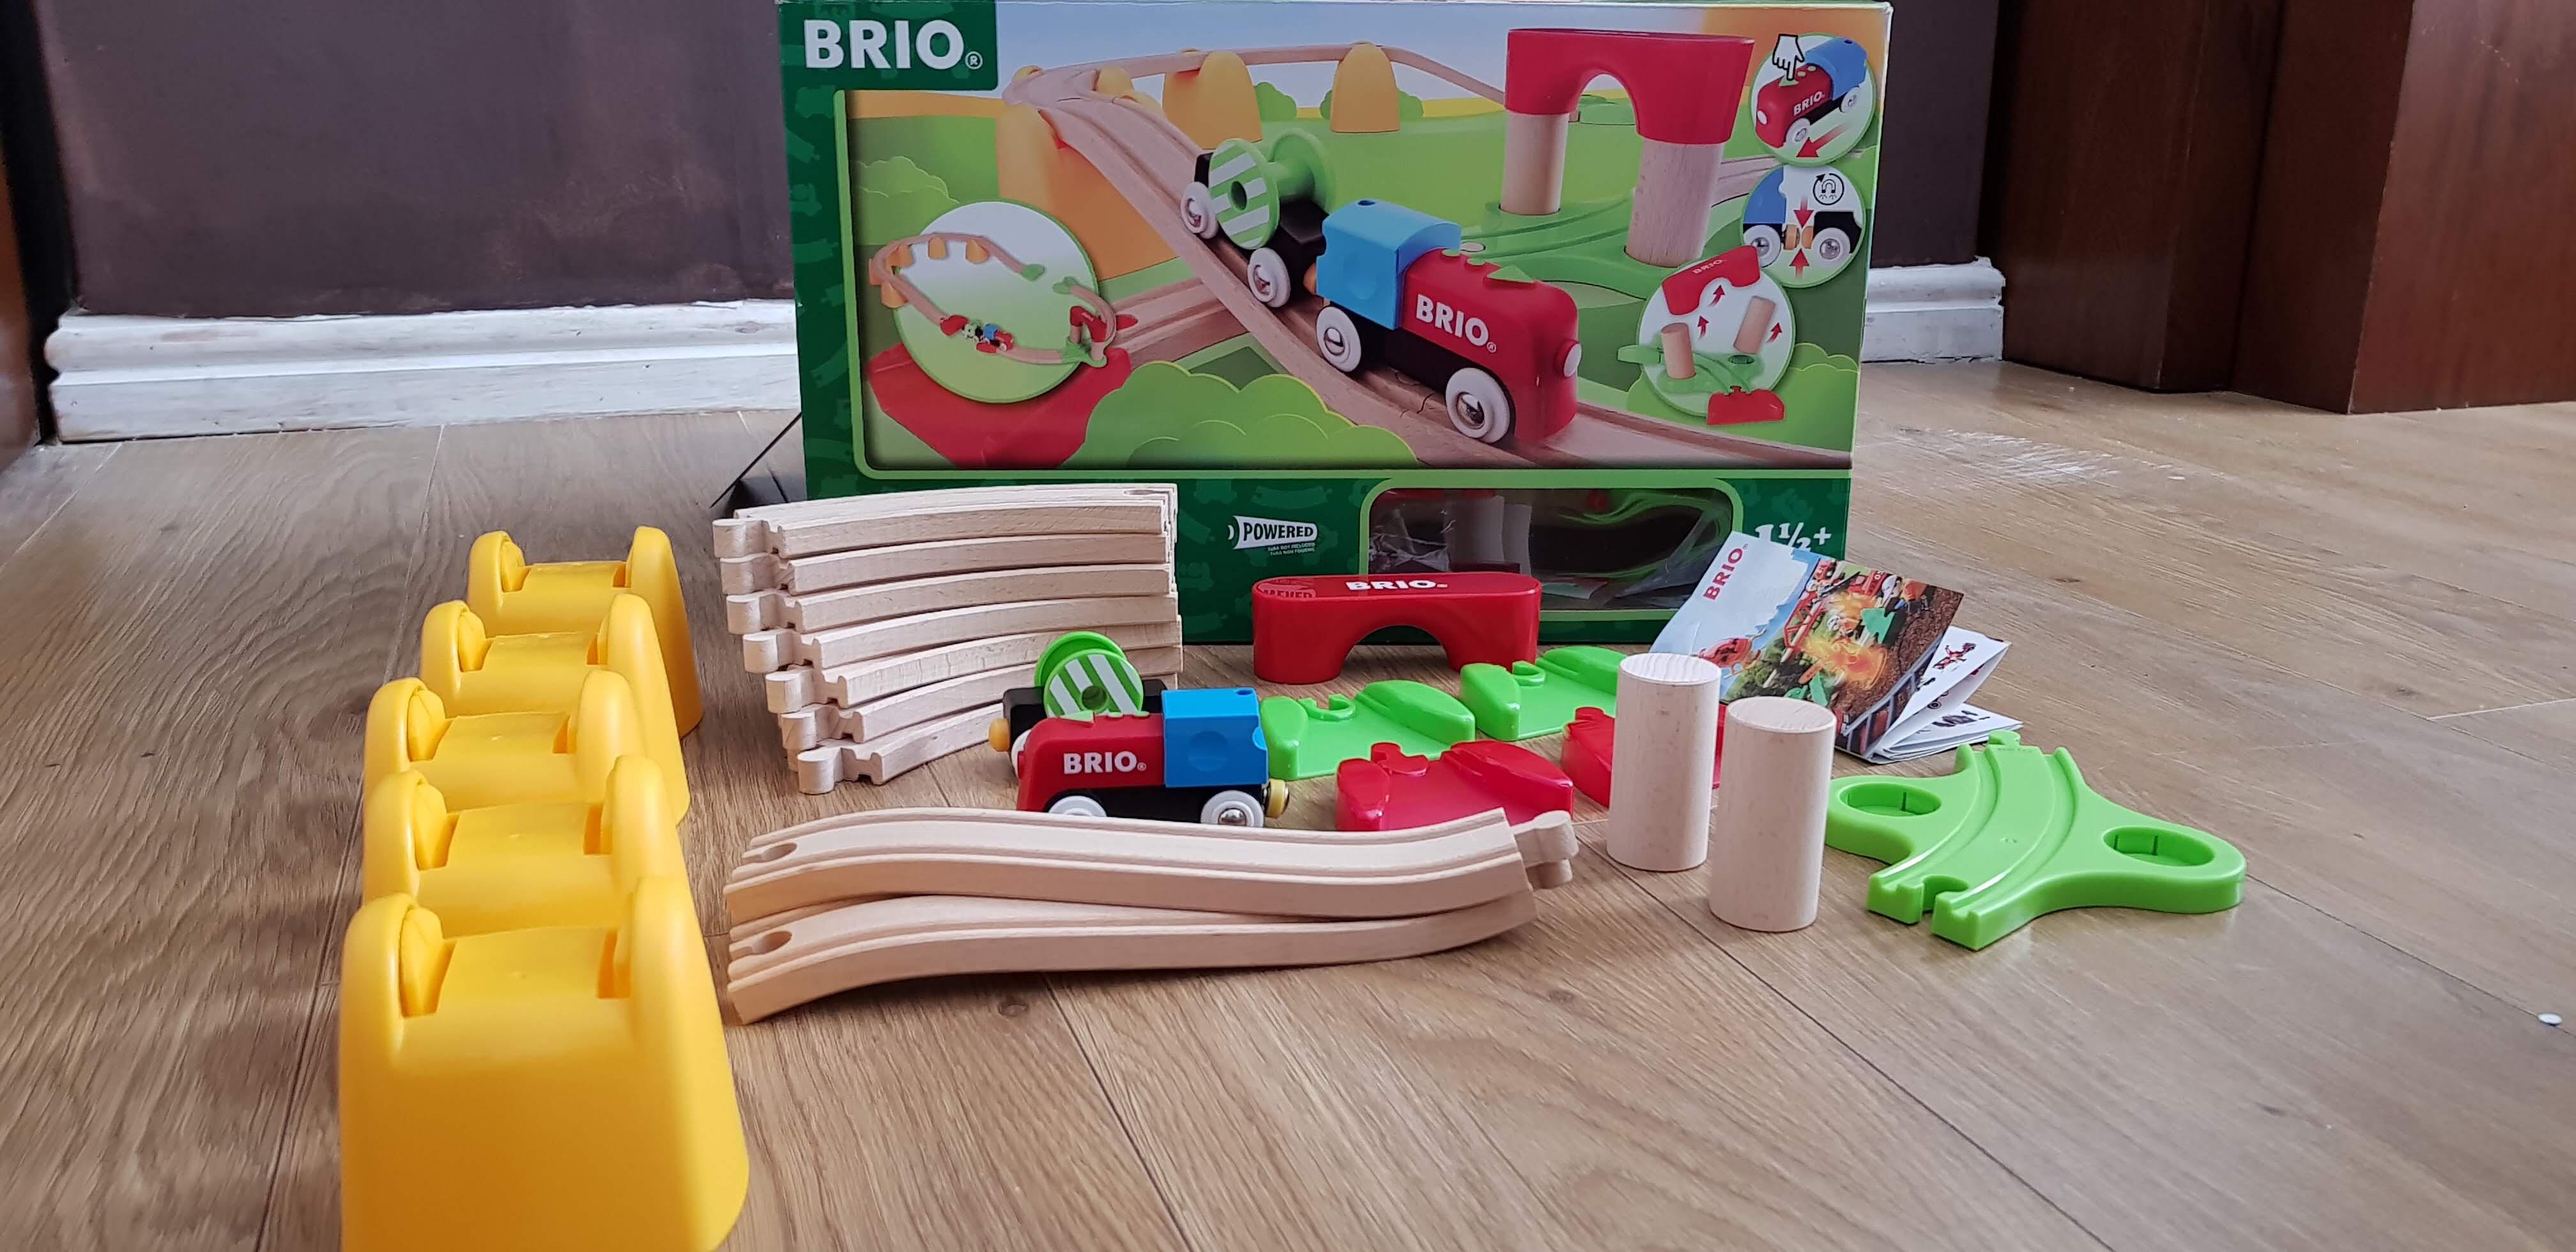 Brio my first railway battery operated train set raw childhood